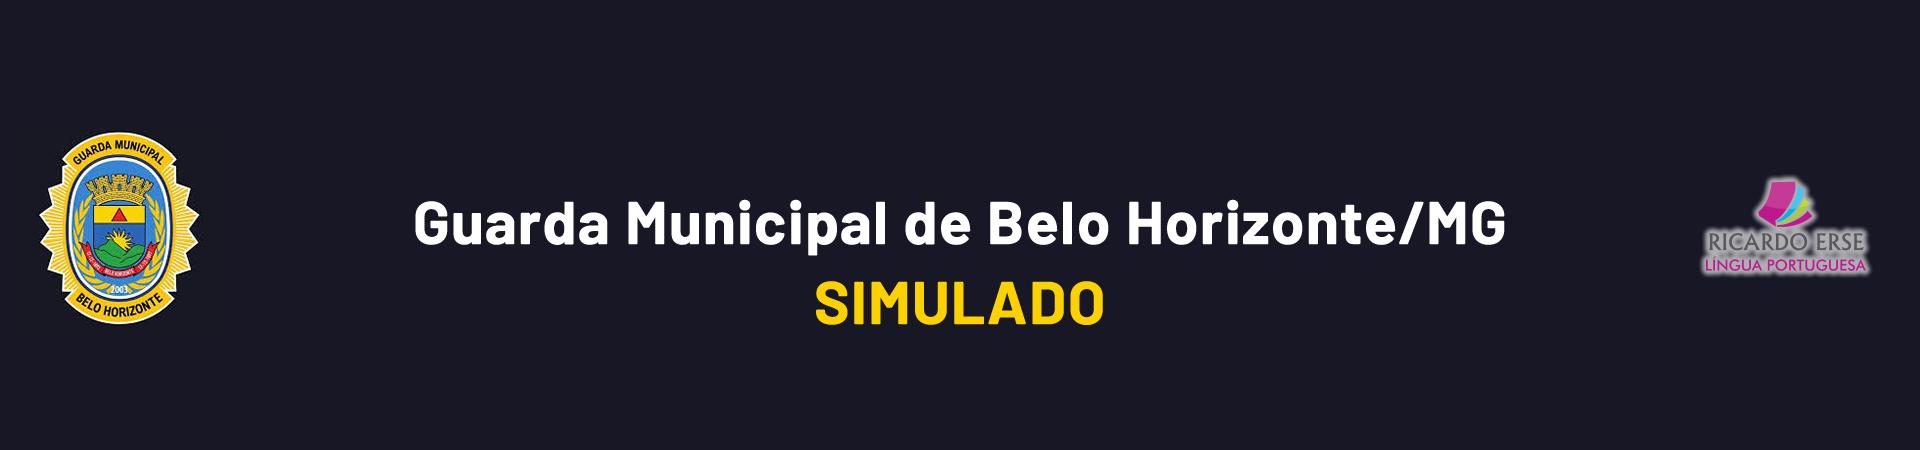 Guarda Municipal de Belo Horizonte/MG - SIMULADO